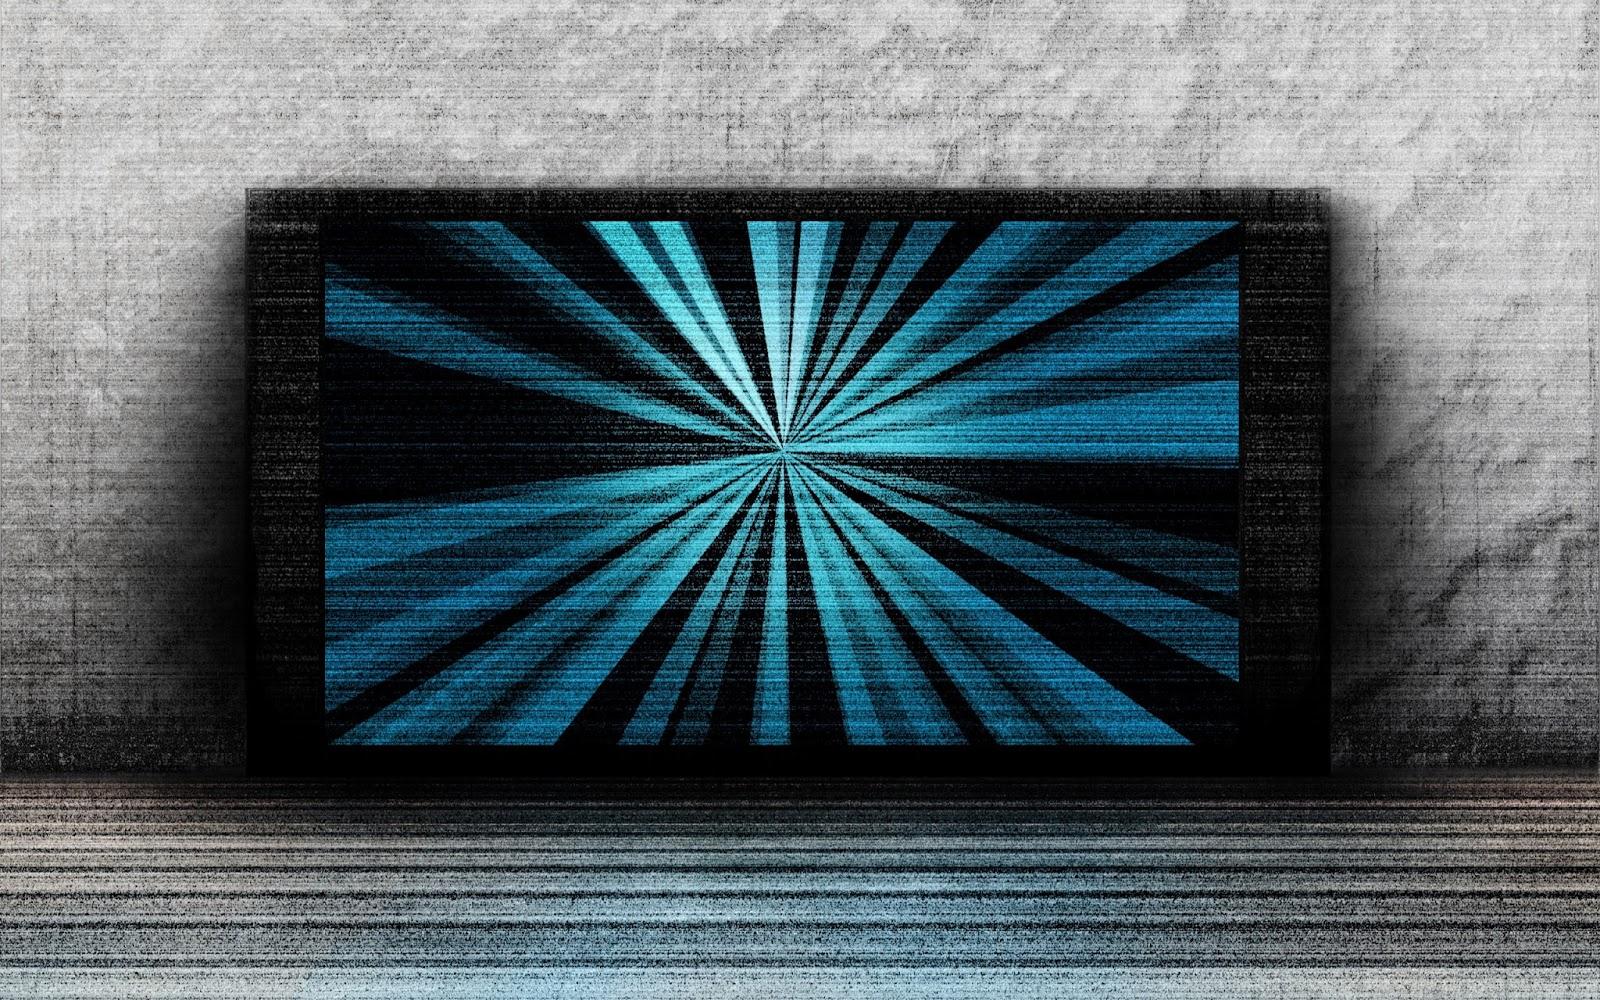 Tv hd wallpaper, hd wallpaper, high definition wallpaper | Amazing Wallpapers